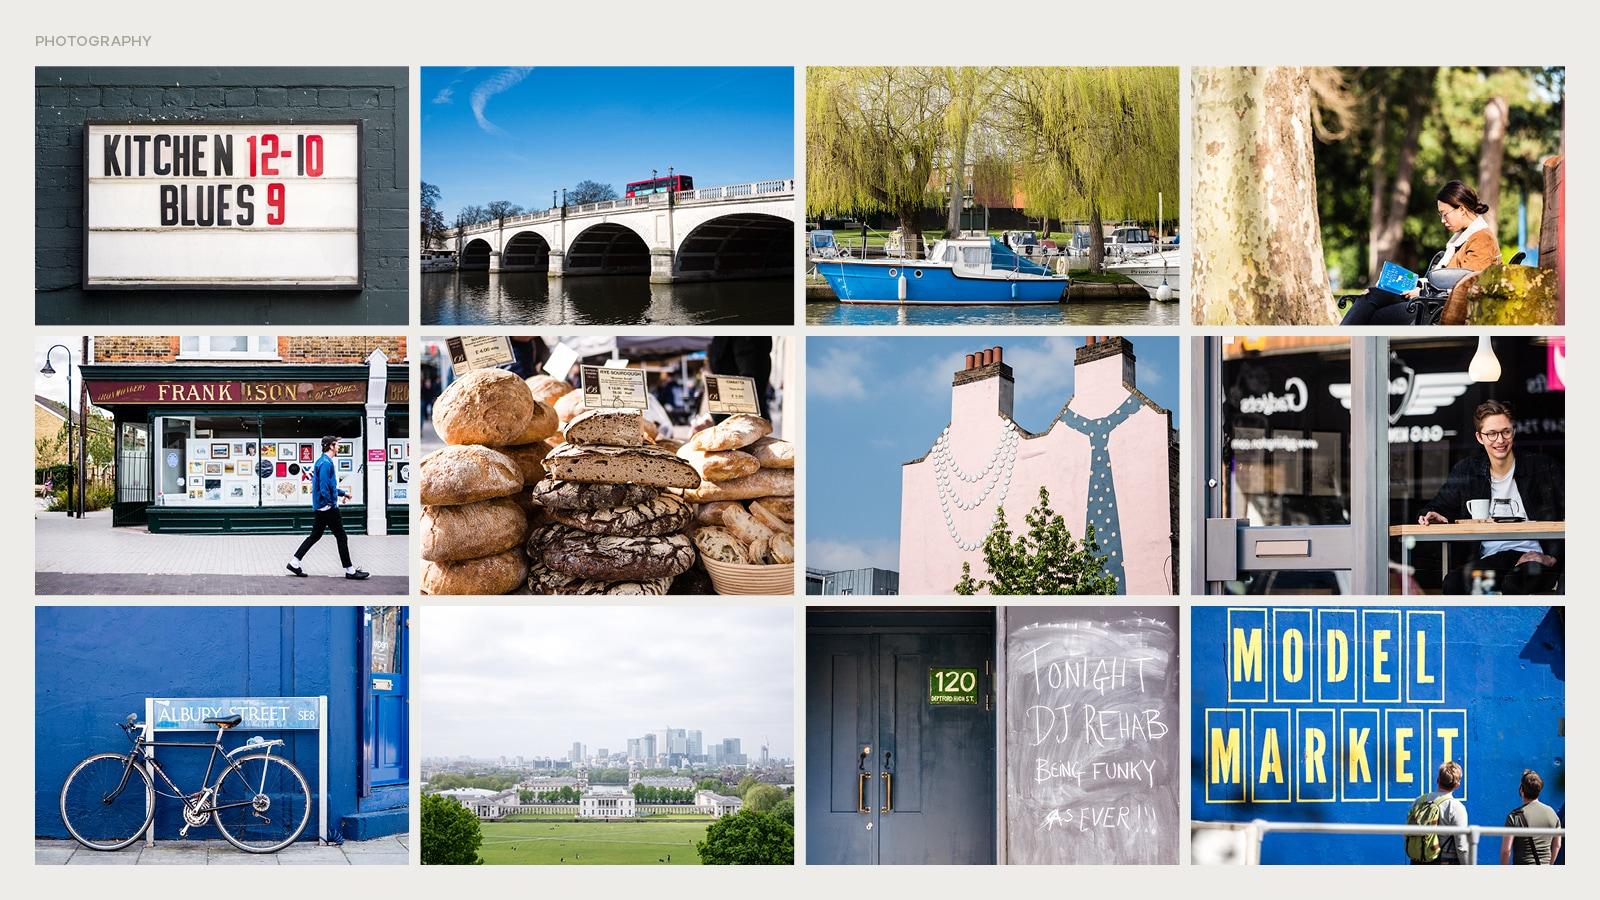 property-marketing-business-communications-branding-graphic-design-milton-keynes-london10